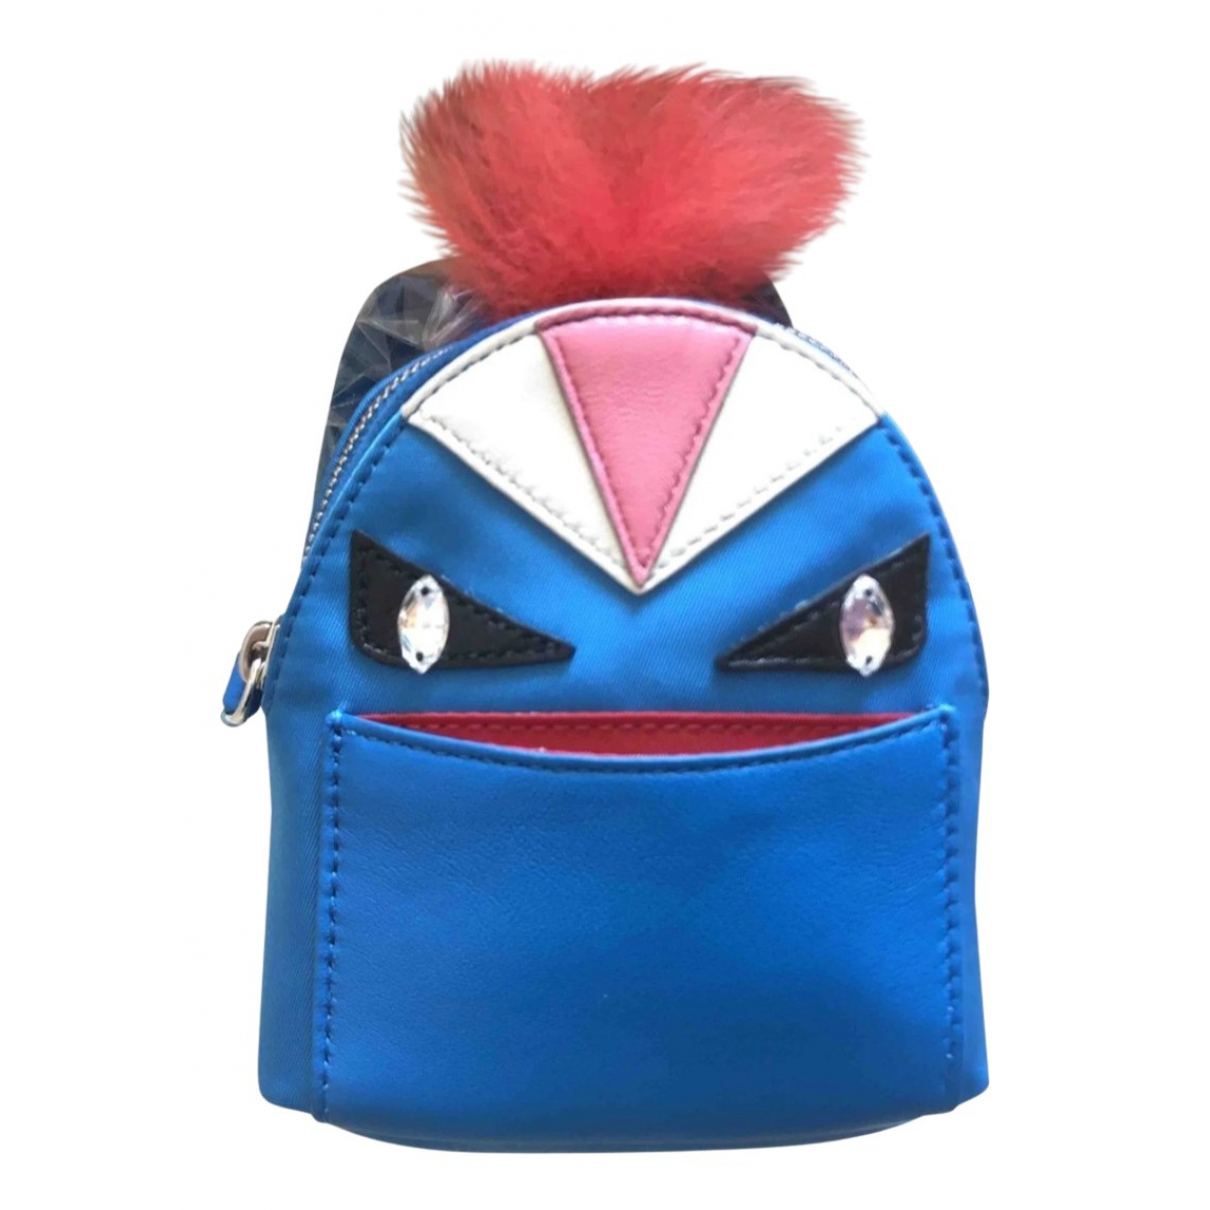 Fendi - Bijoux de sac Sac a Dos pour femme en toile - bleu